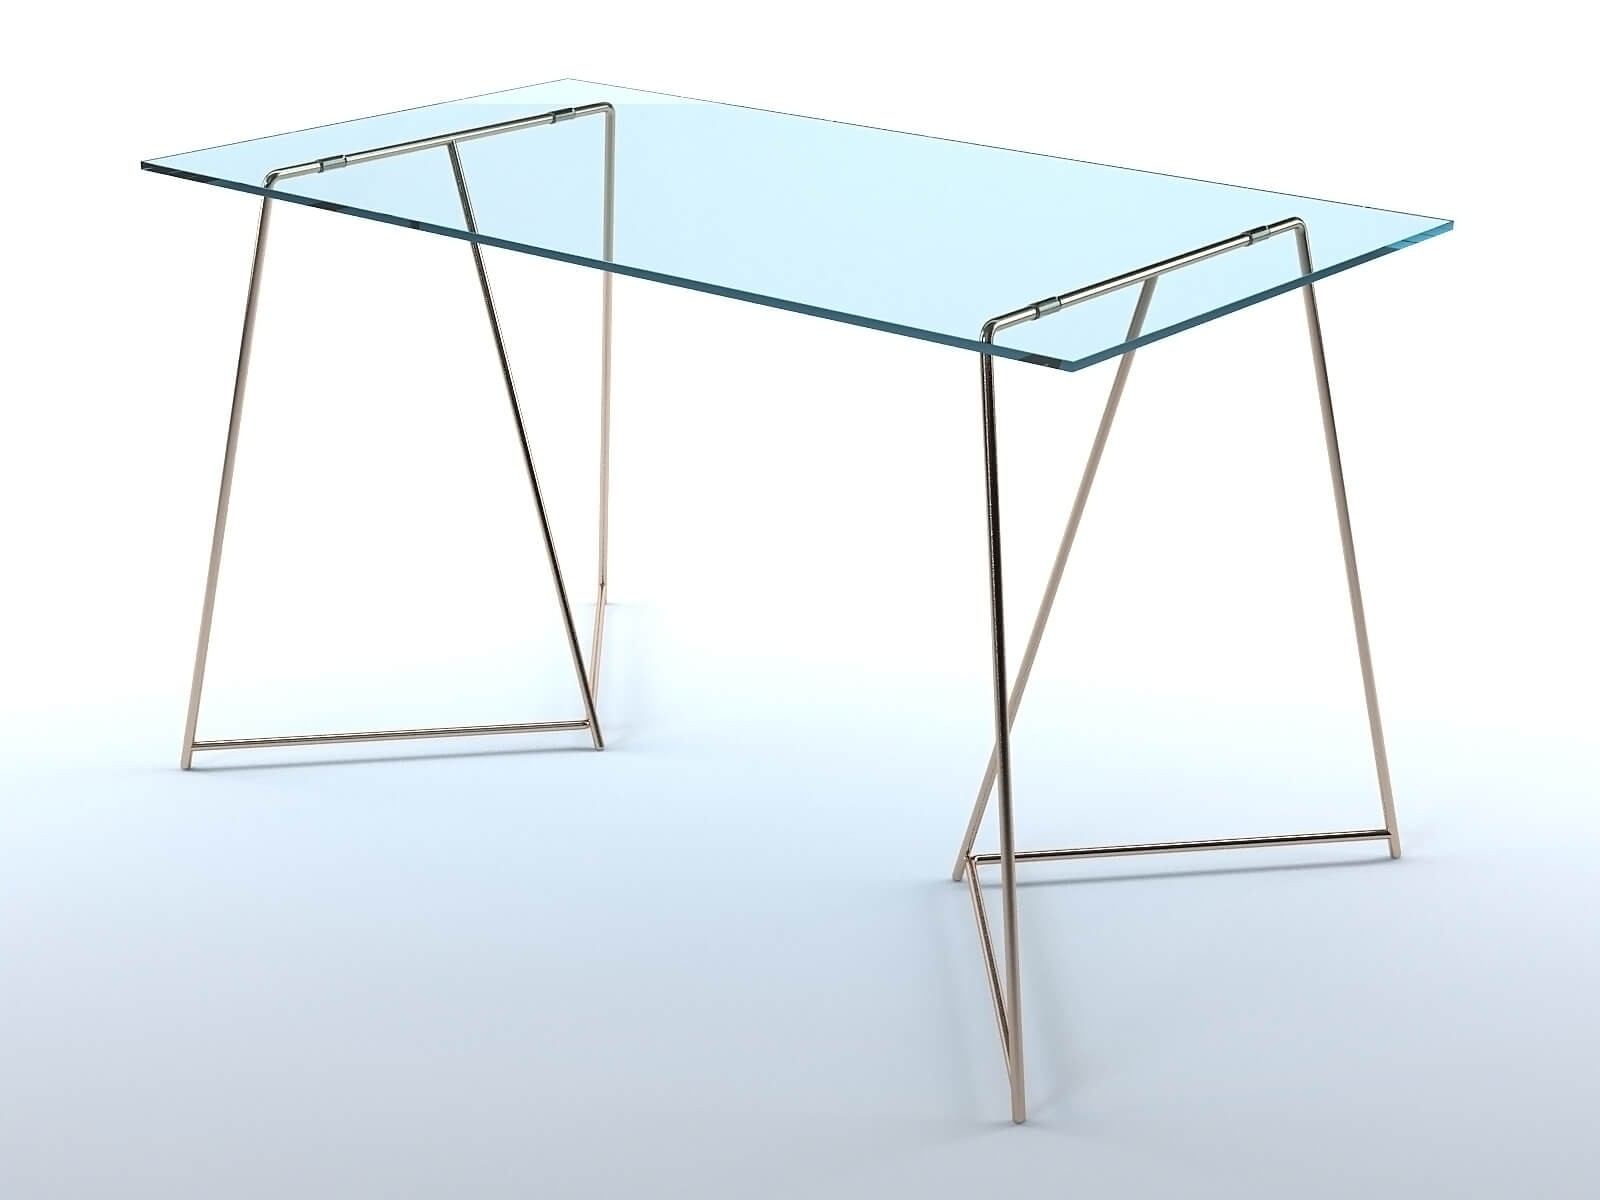 Patrizia glass table